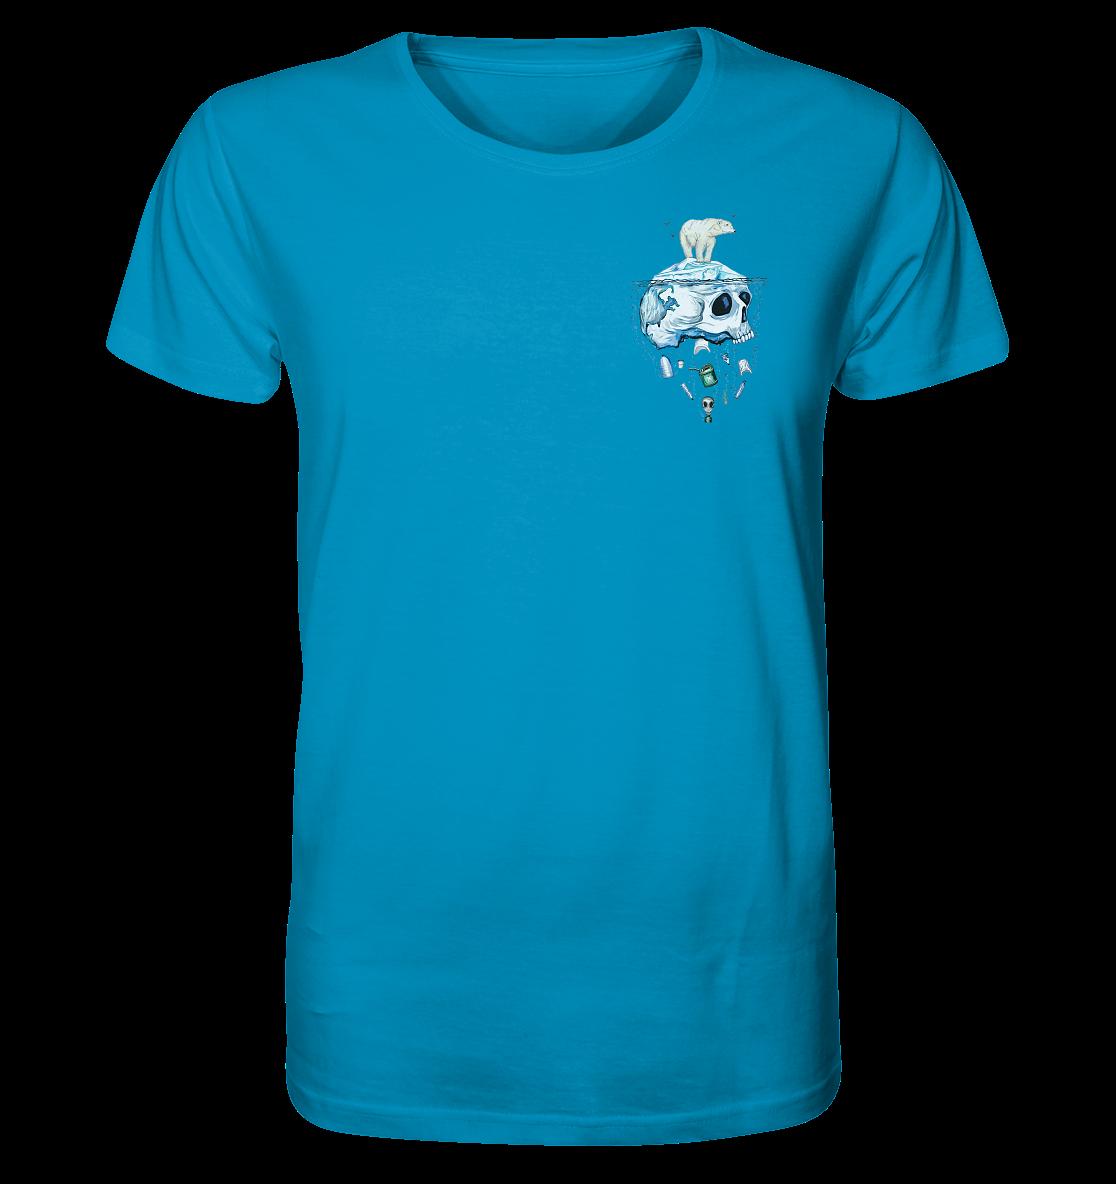 front-organic-shirt-0092c0-1116x-2.png